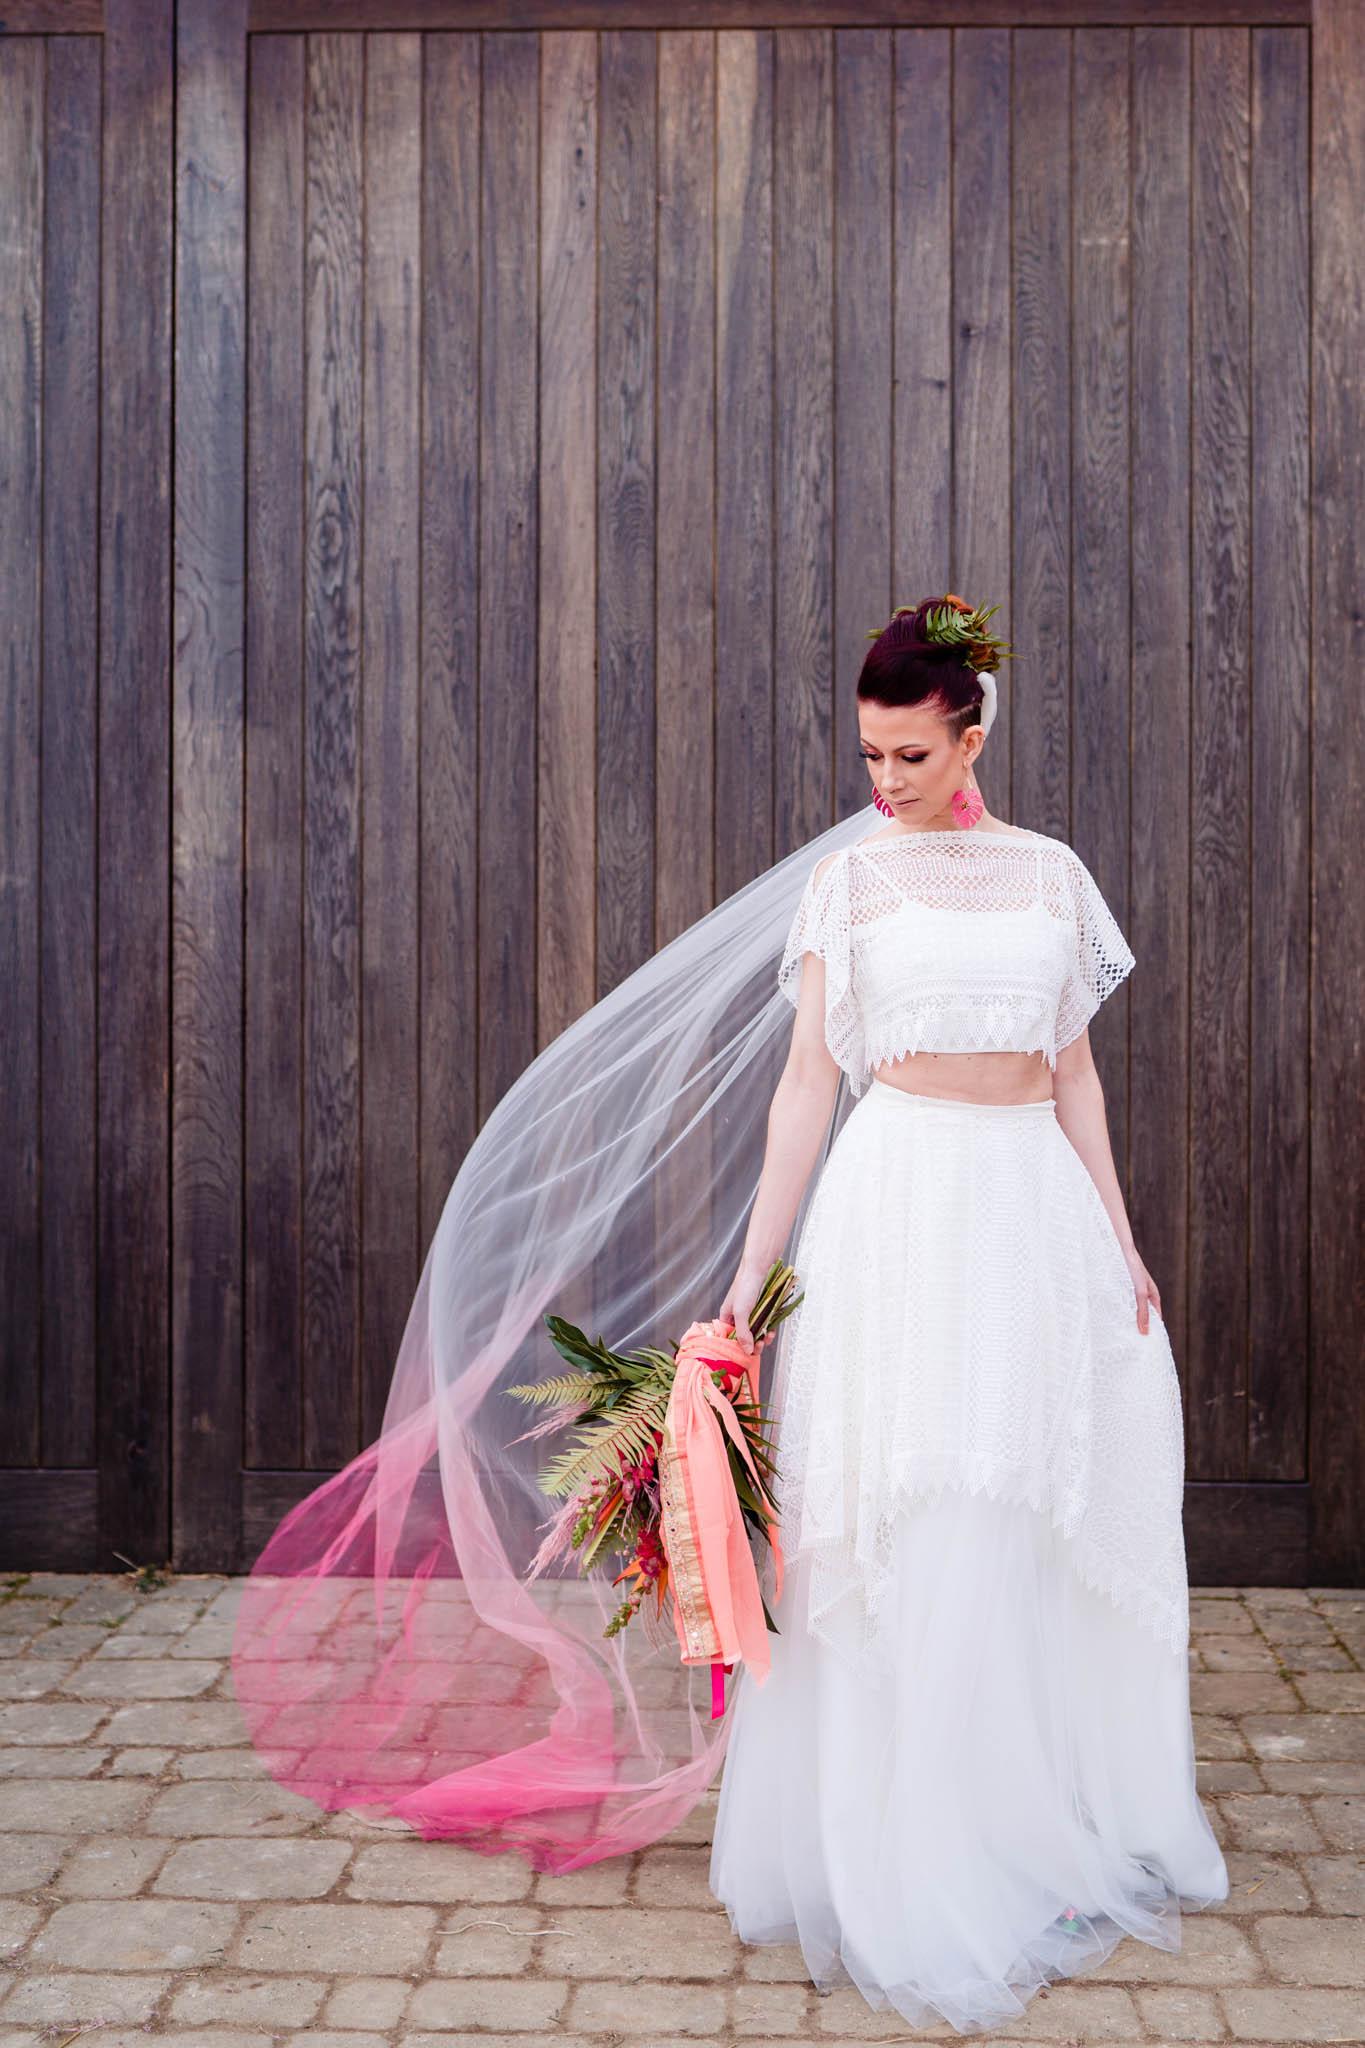 ombre veil - unique wedding dress - modern tropical wedding - modern wedding - modern bride - east midlands wedding planner